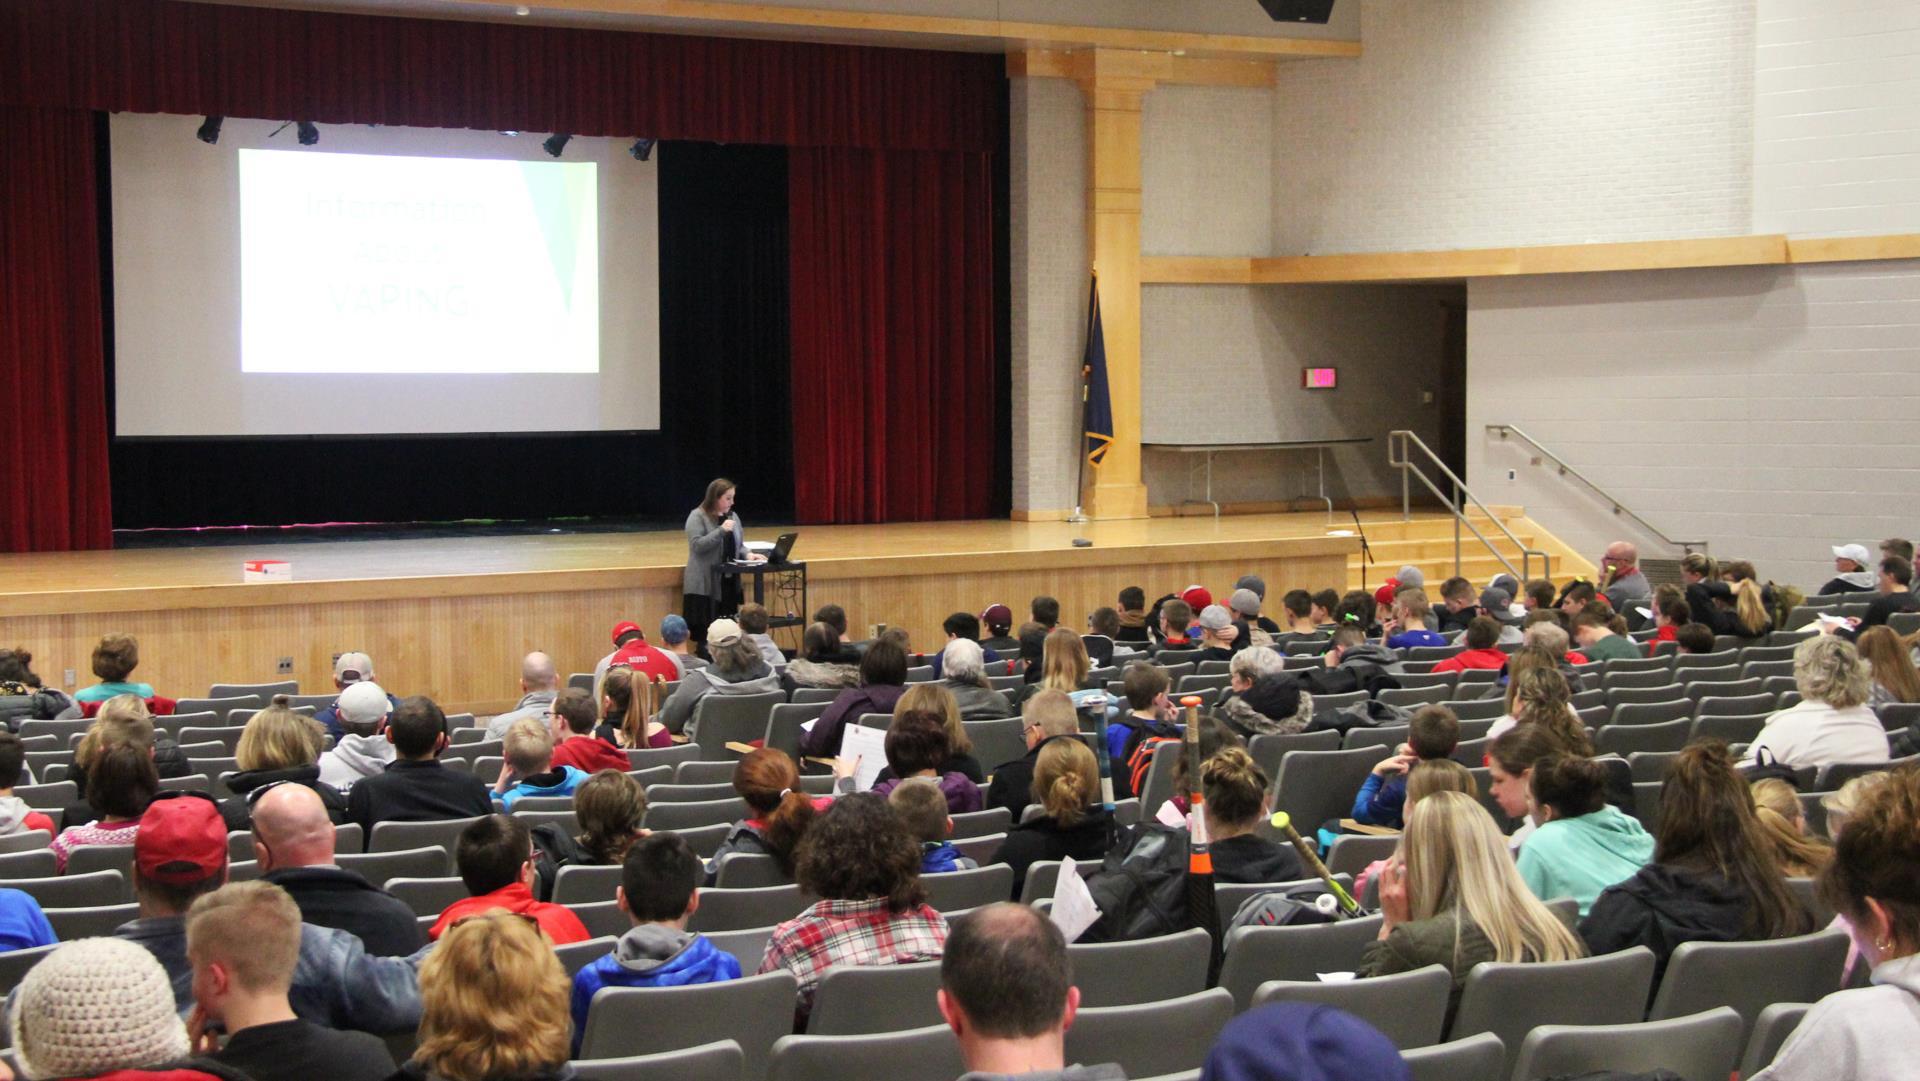 educator sharing presentation